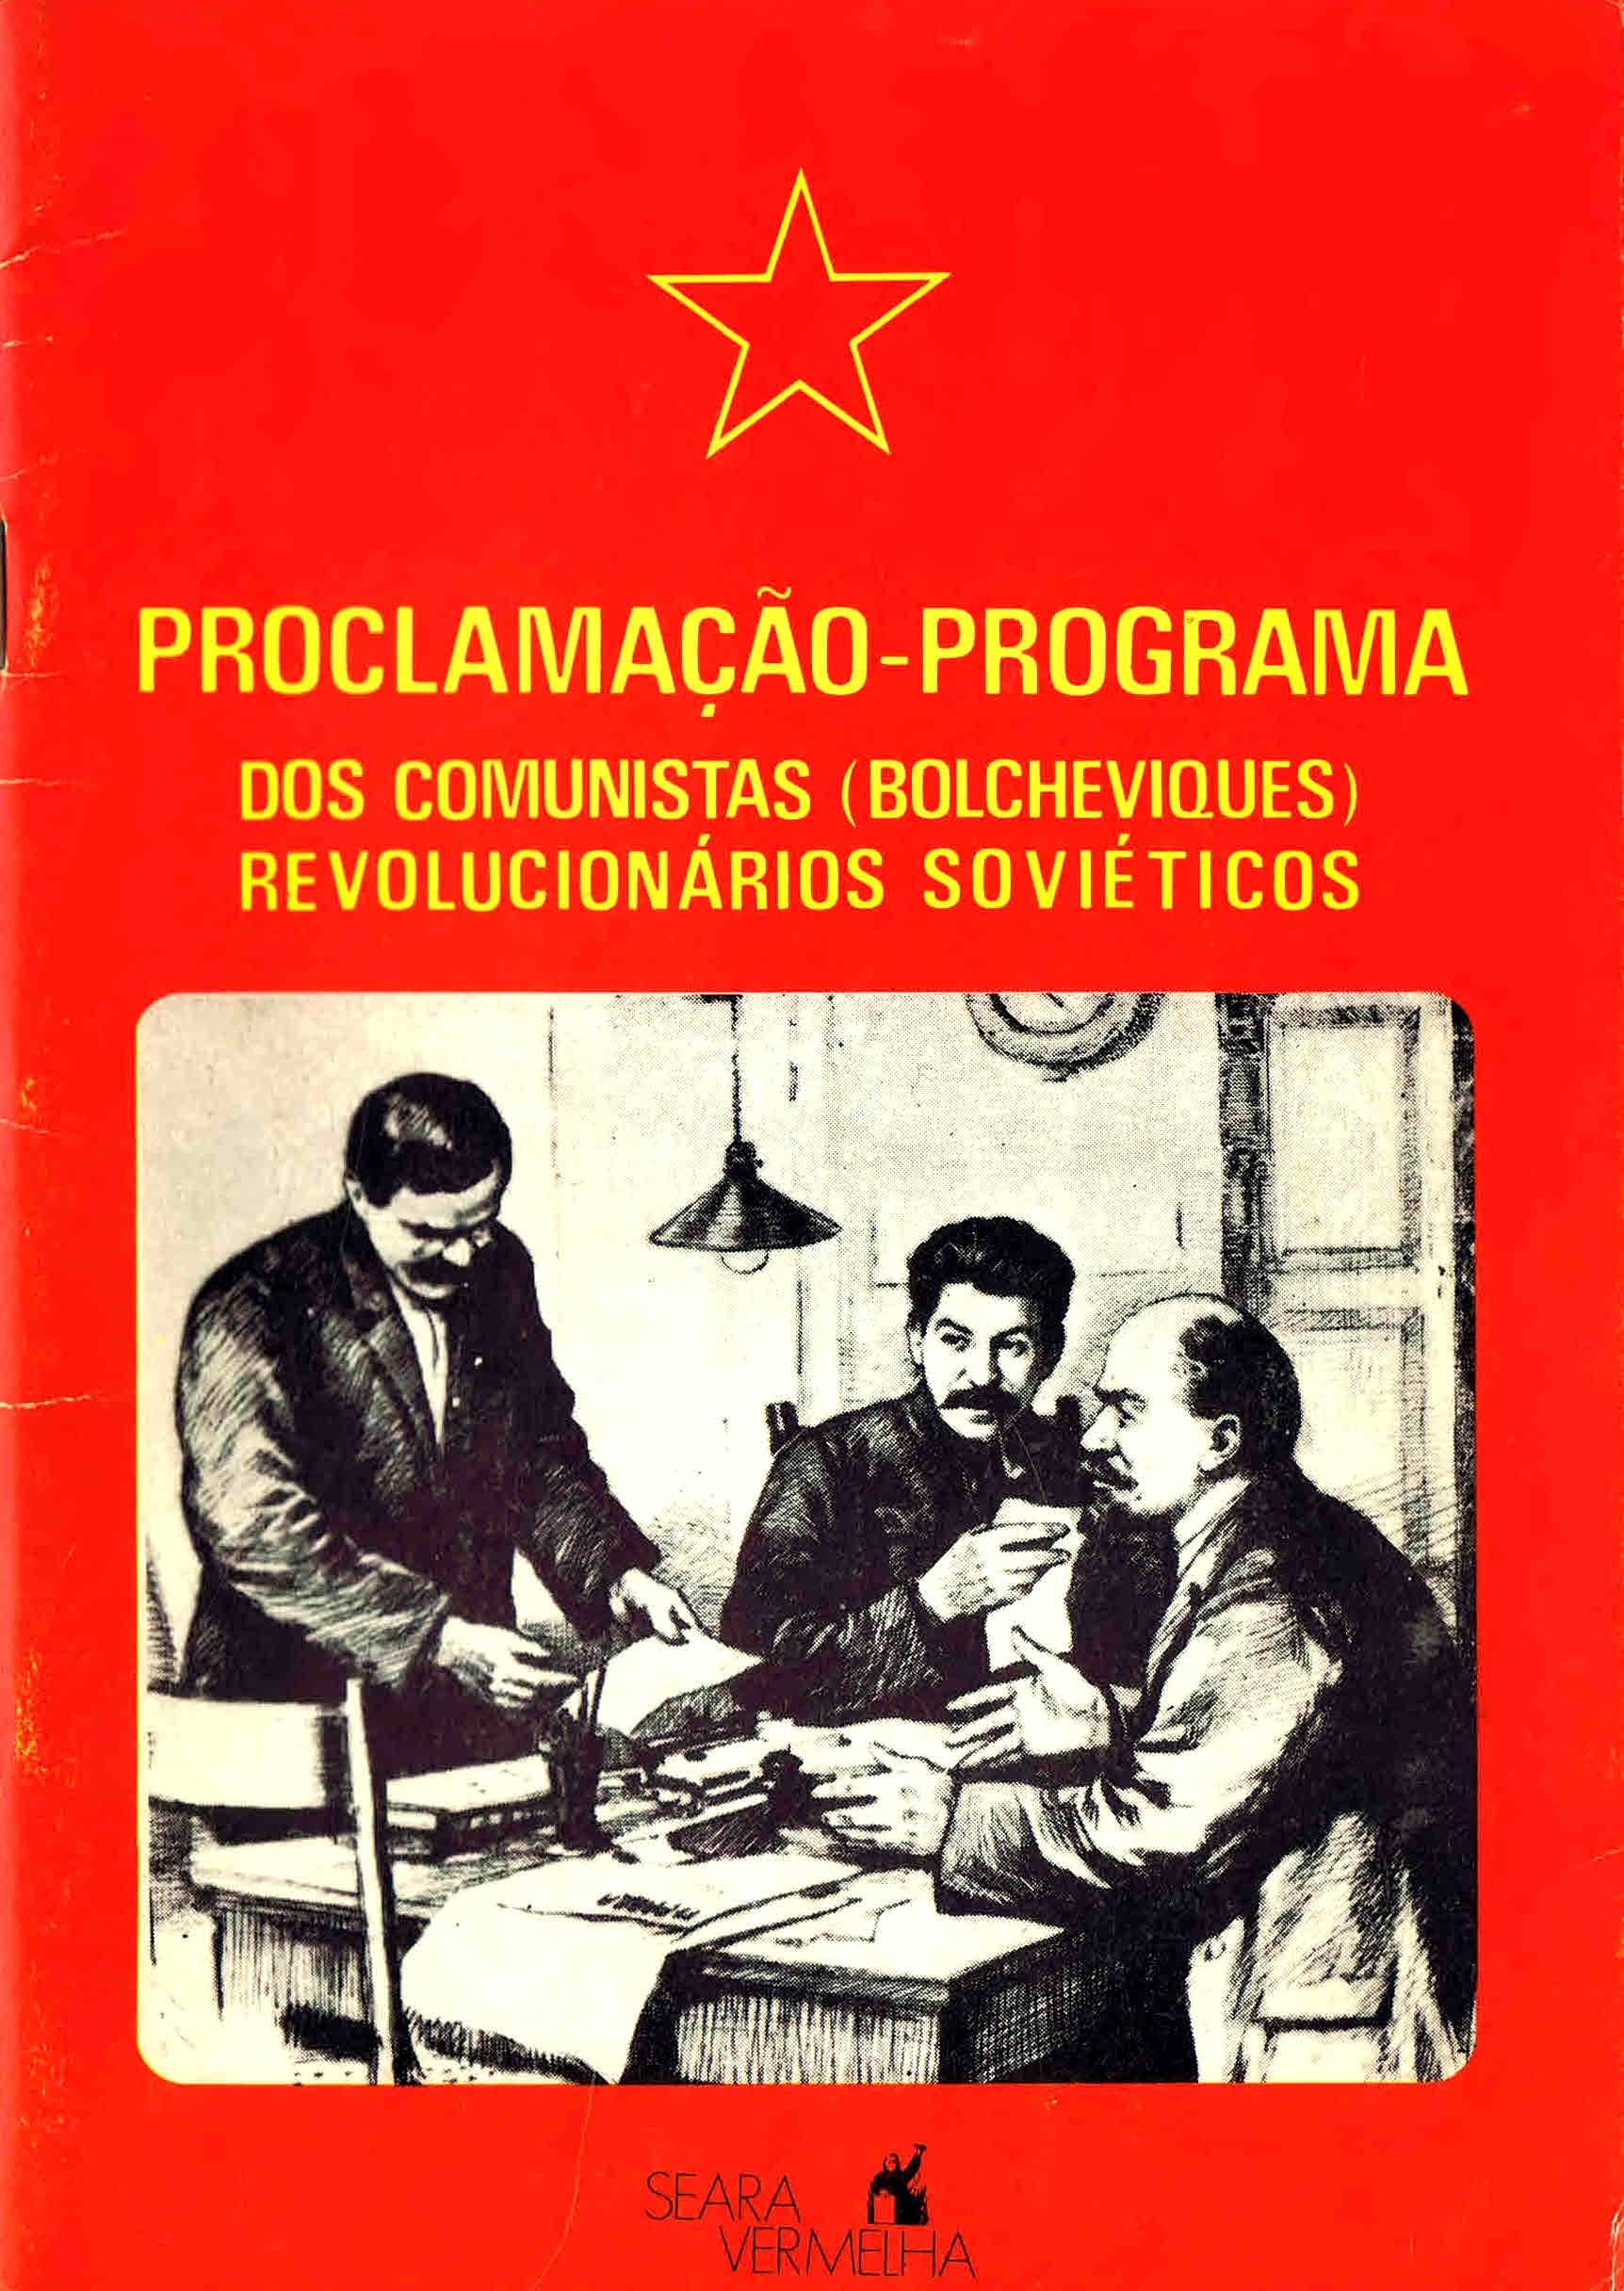 programaçao-programa dos comunistas (bolcheviques) revolucionarios sovieticos